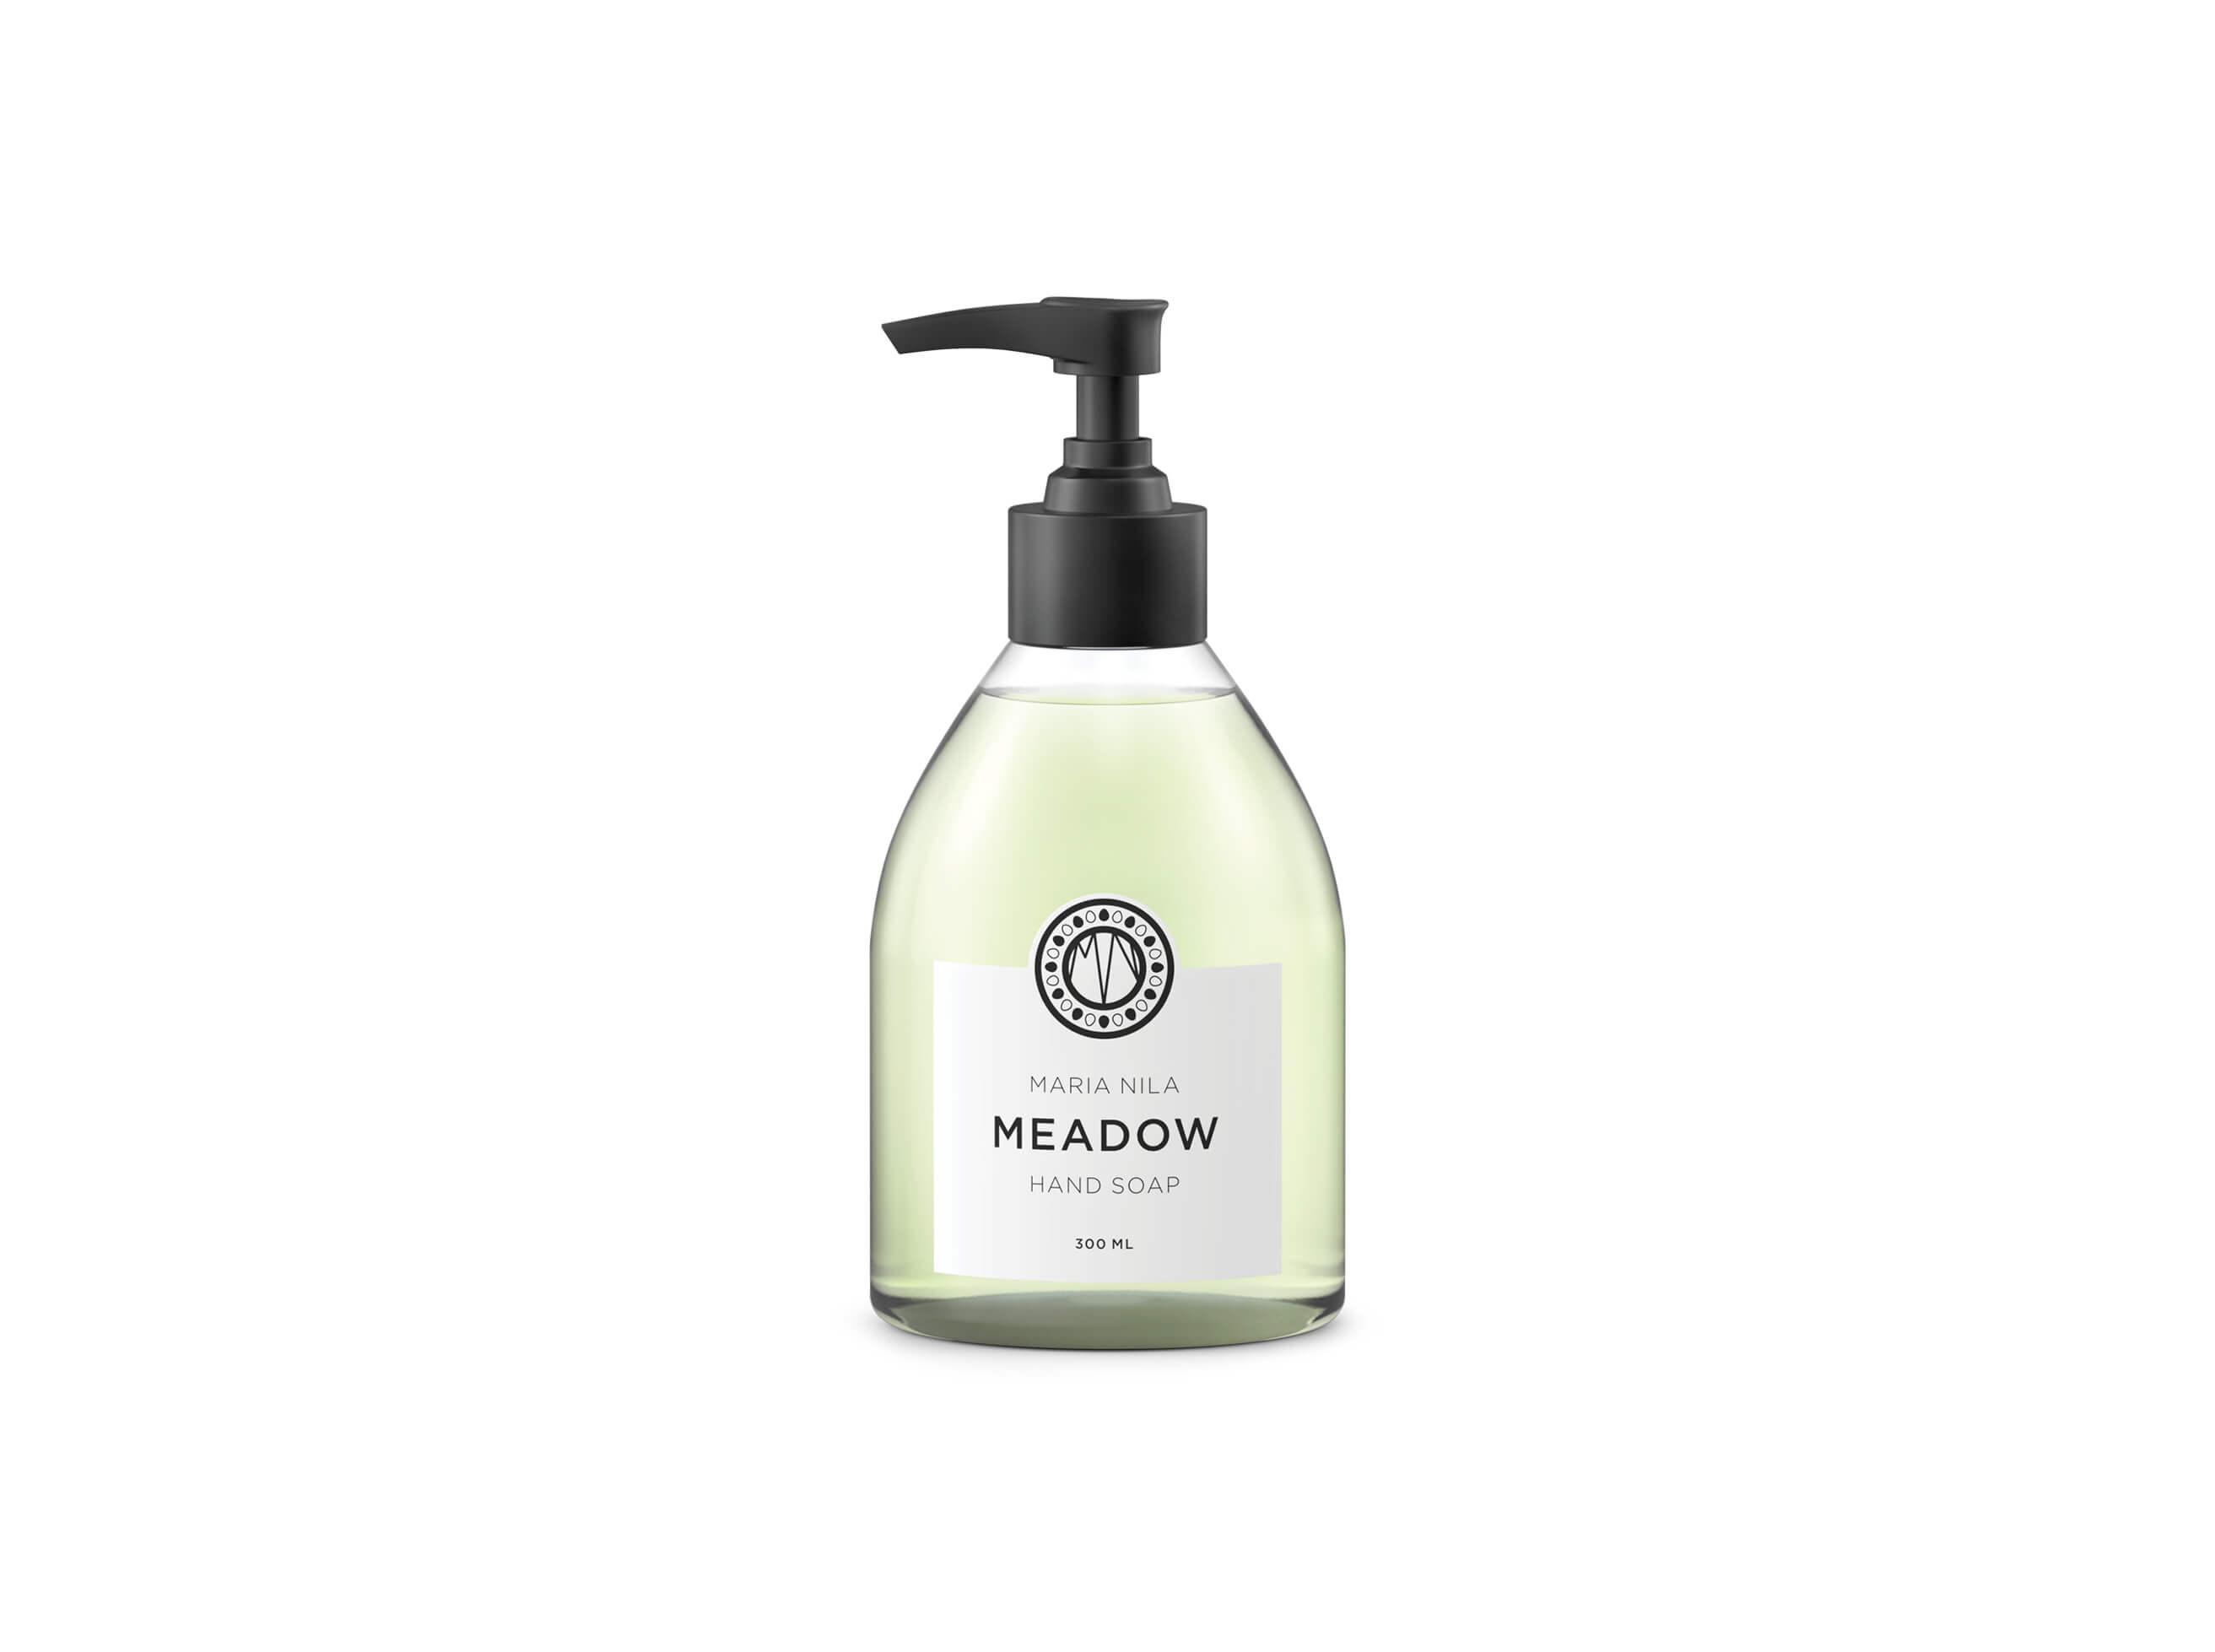 Meadow Hand Soap